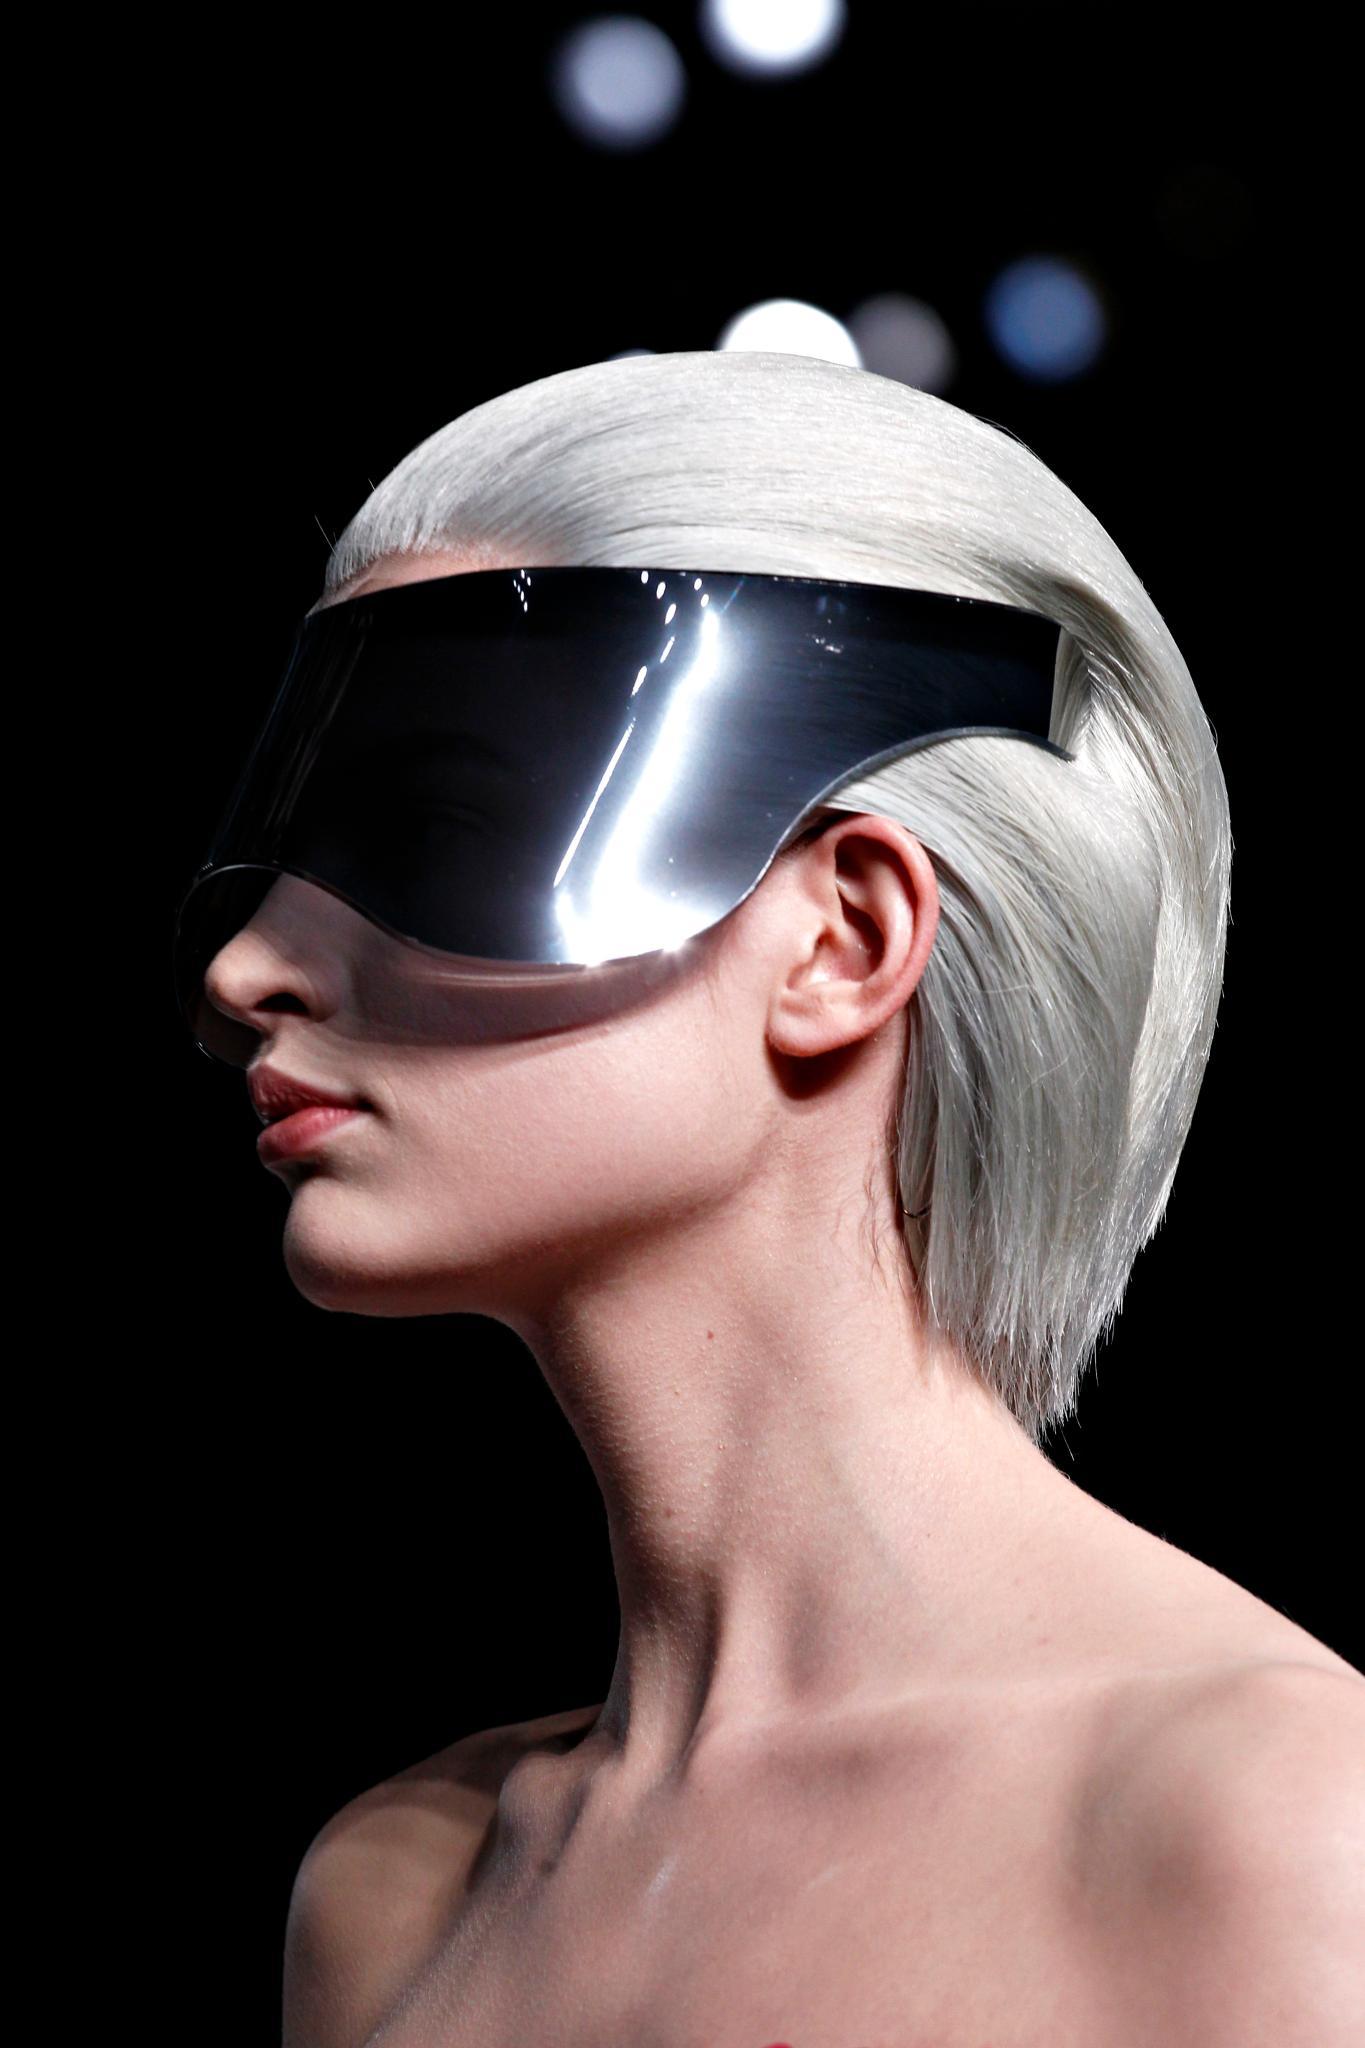 bob hacia atrás color blanco gris con vincha anteojos mcqueen